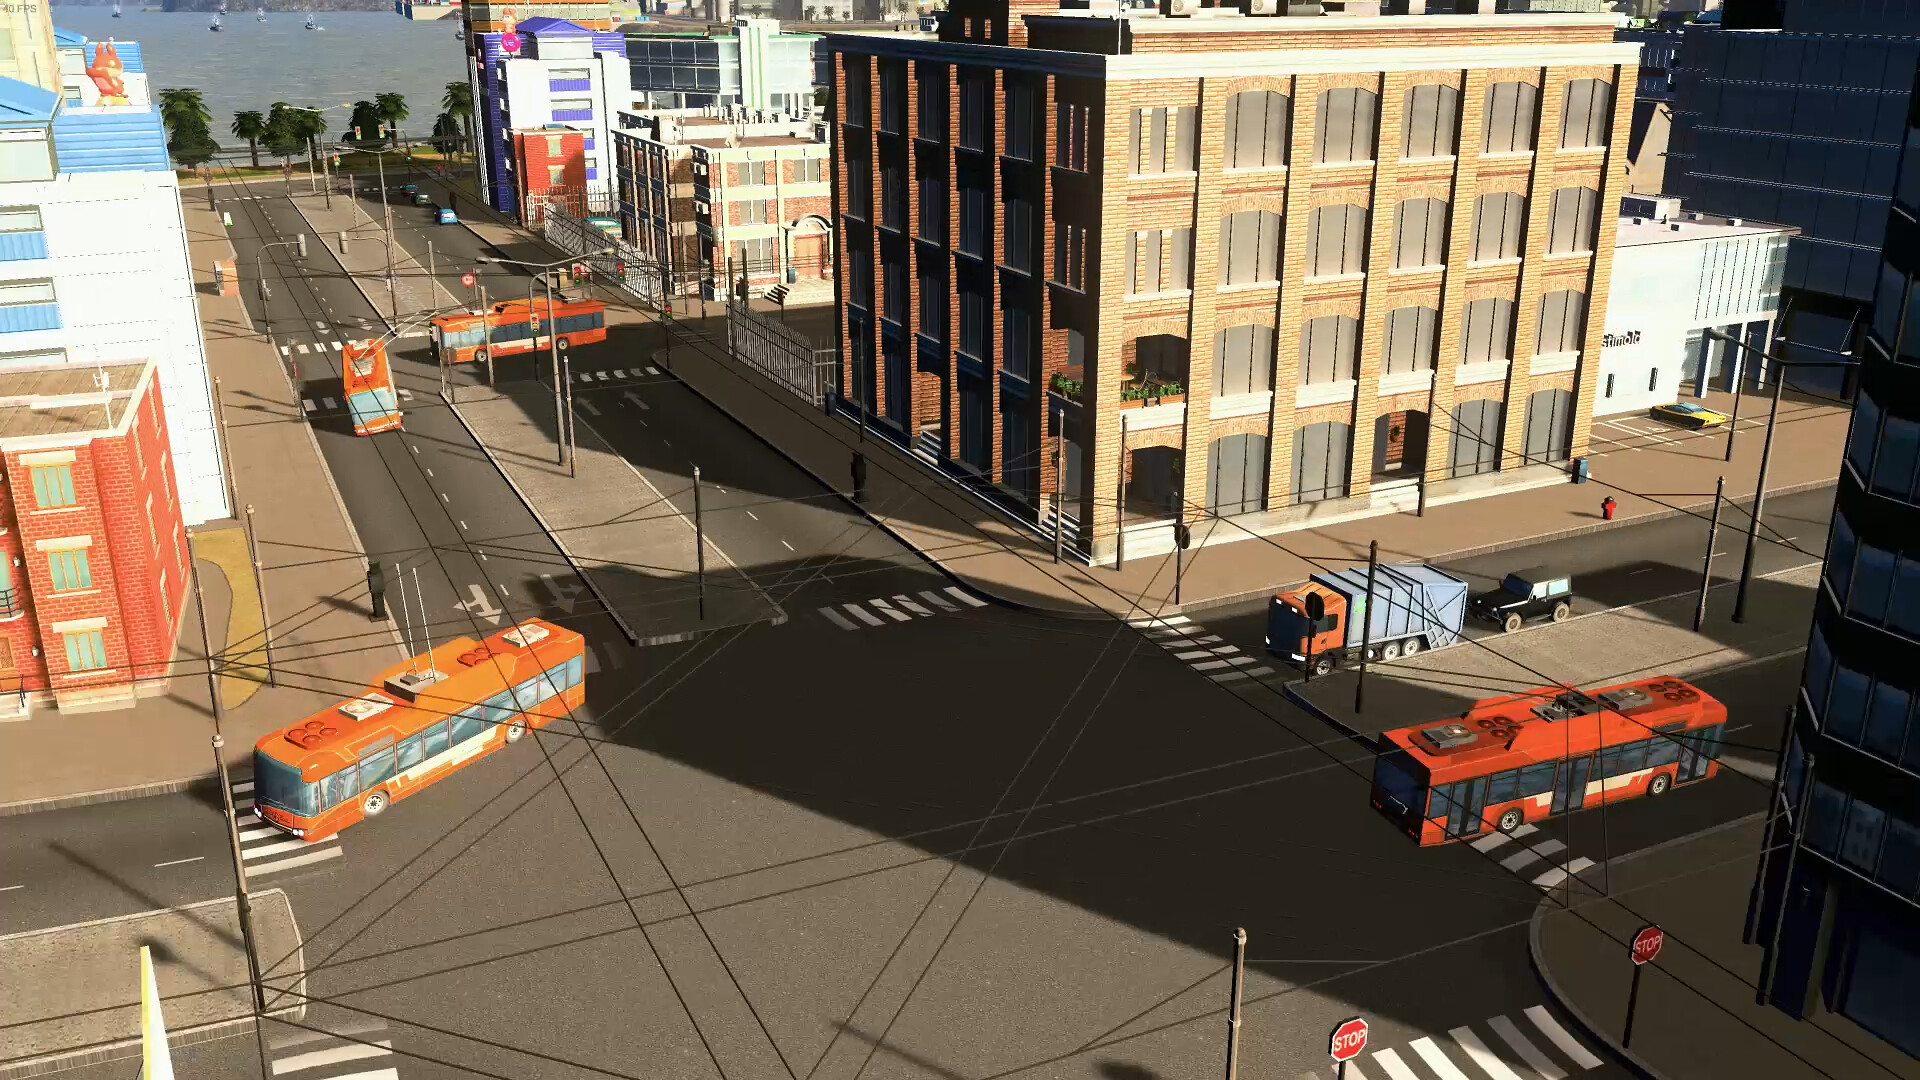 Cities: Skylines - Sunset Harbor on PS4